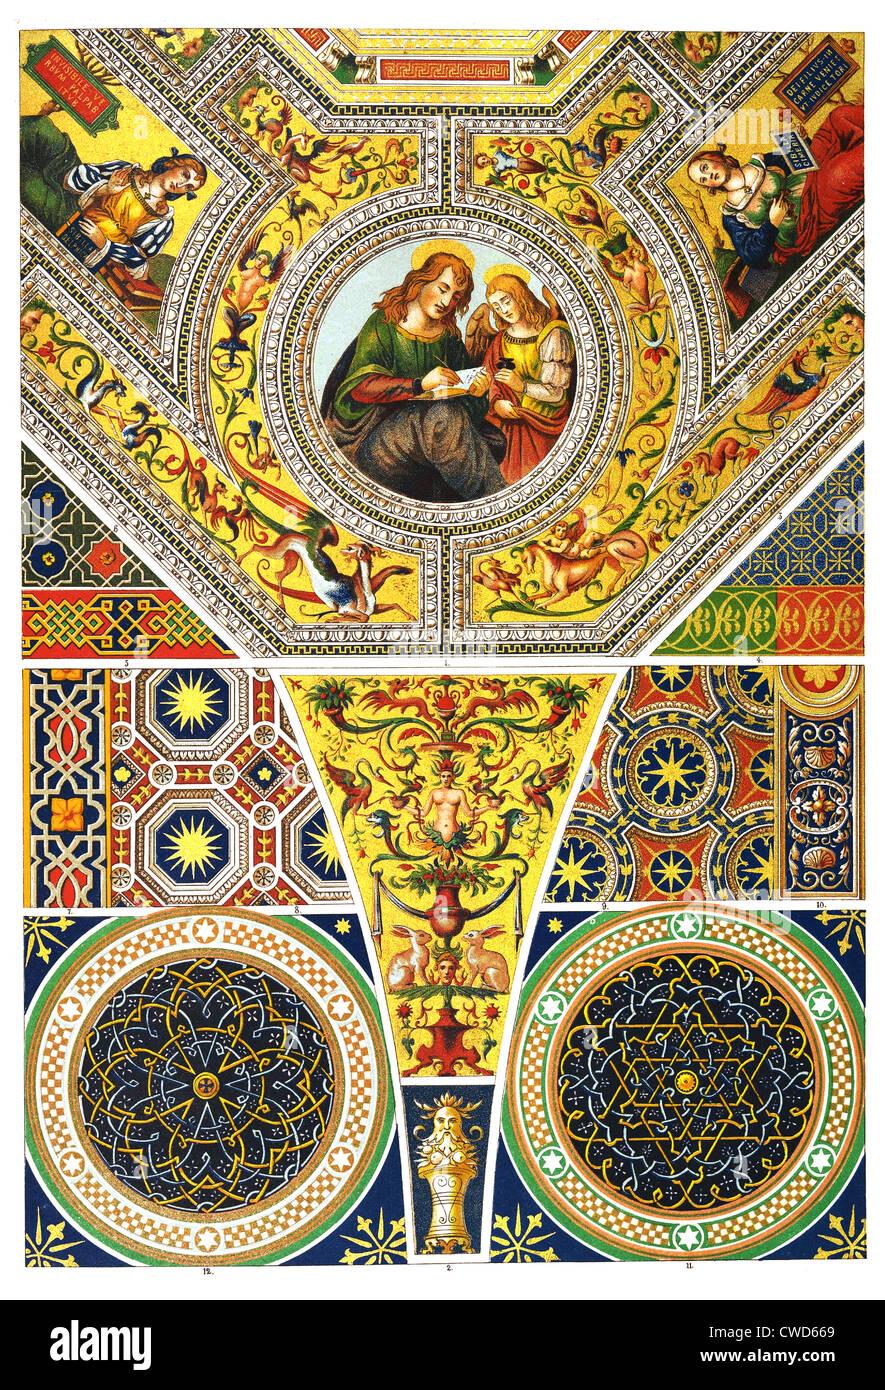 Italienische Renaissance bemalte Decke Stockbild